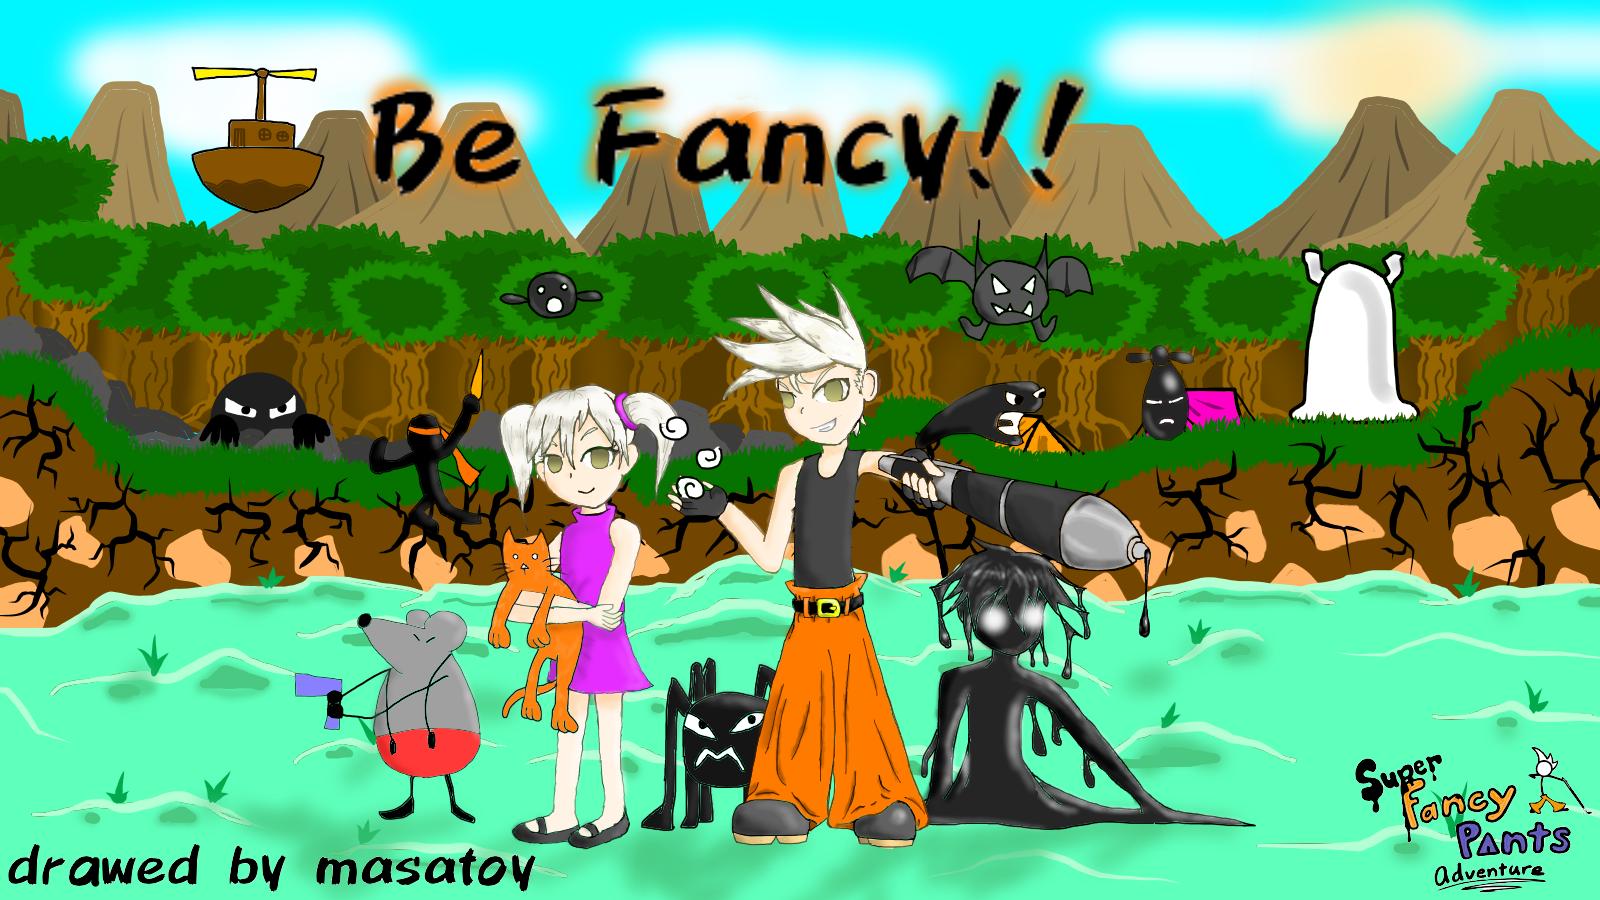 Steam Community Super Fancy Pants Adventure